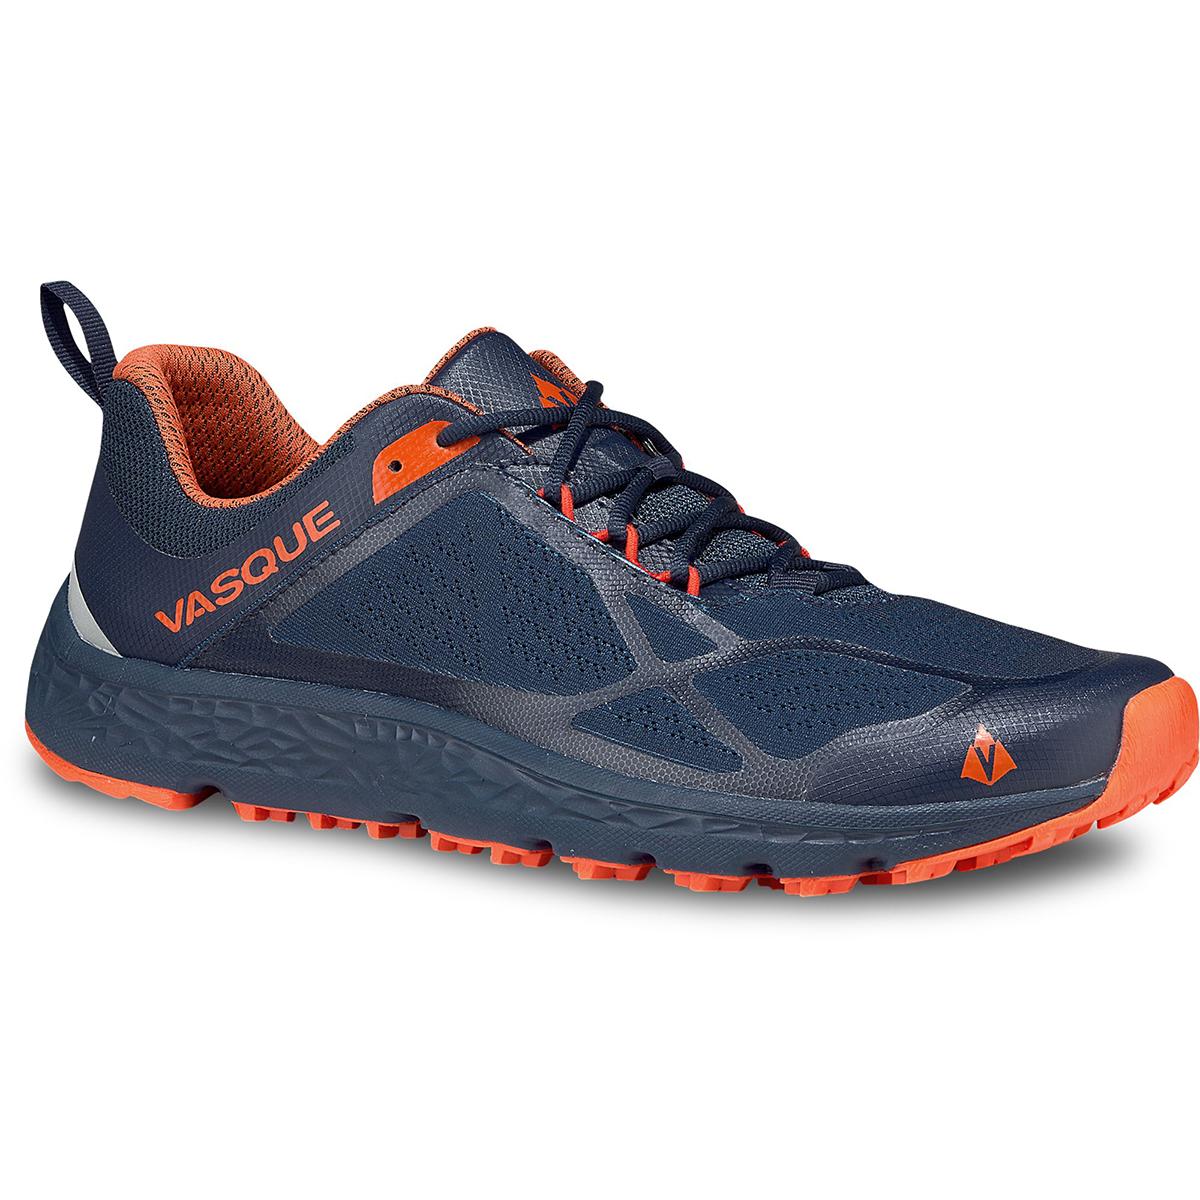 Vasque Men's Velocity All Terrain Trail Running Shoe - Blue, 10